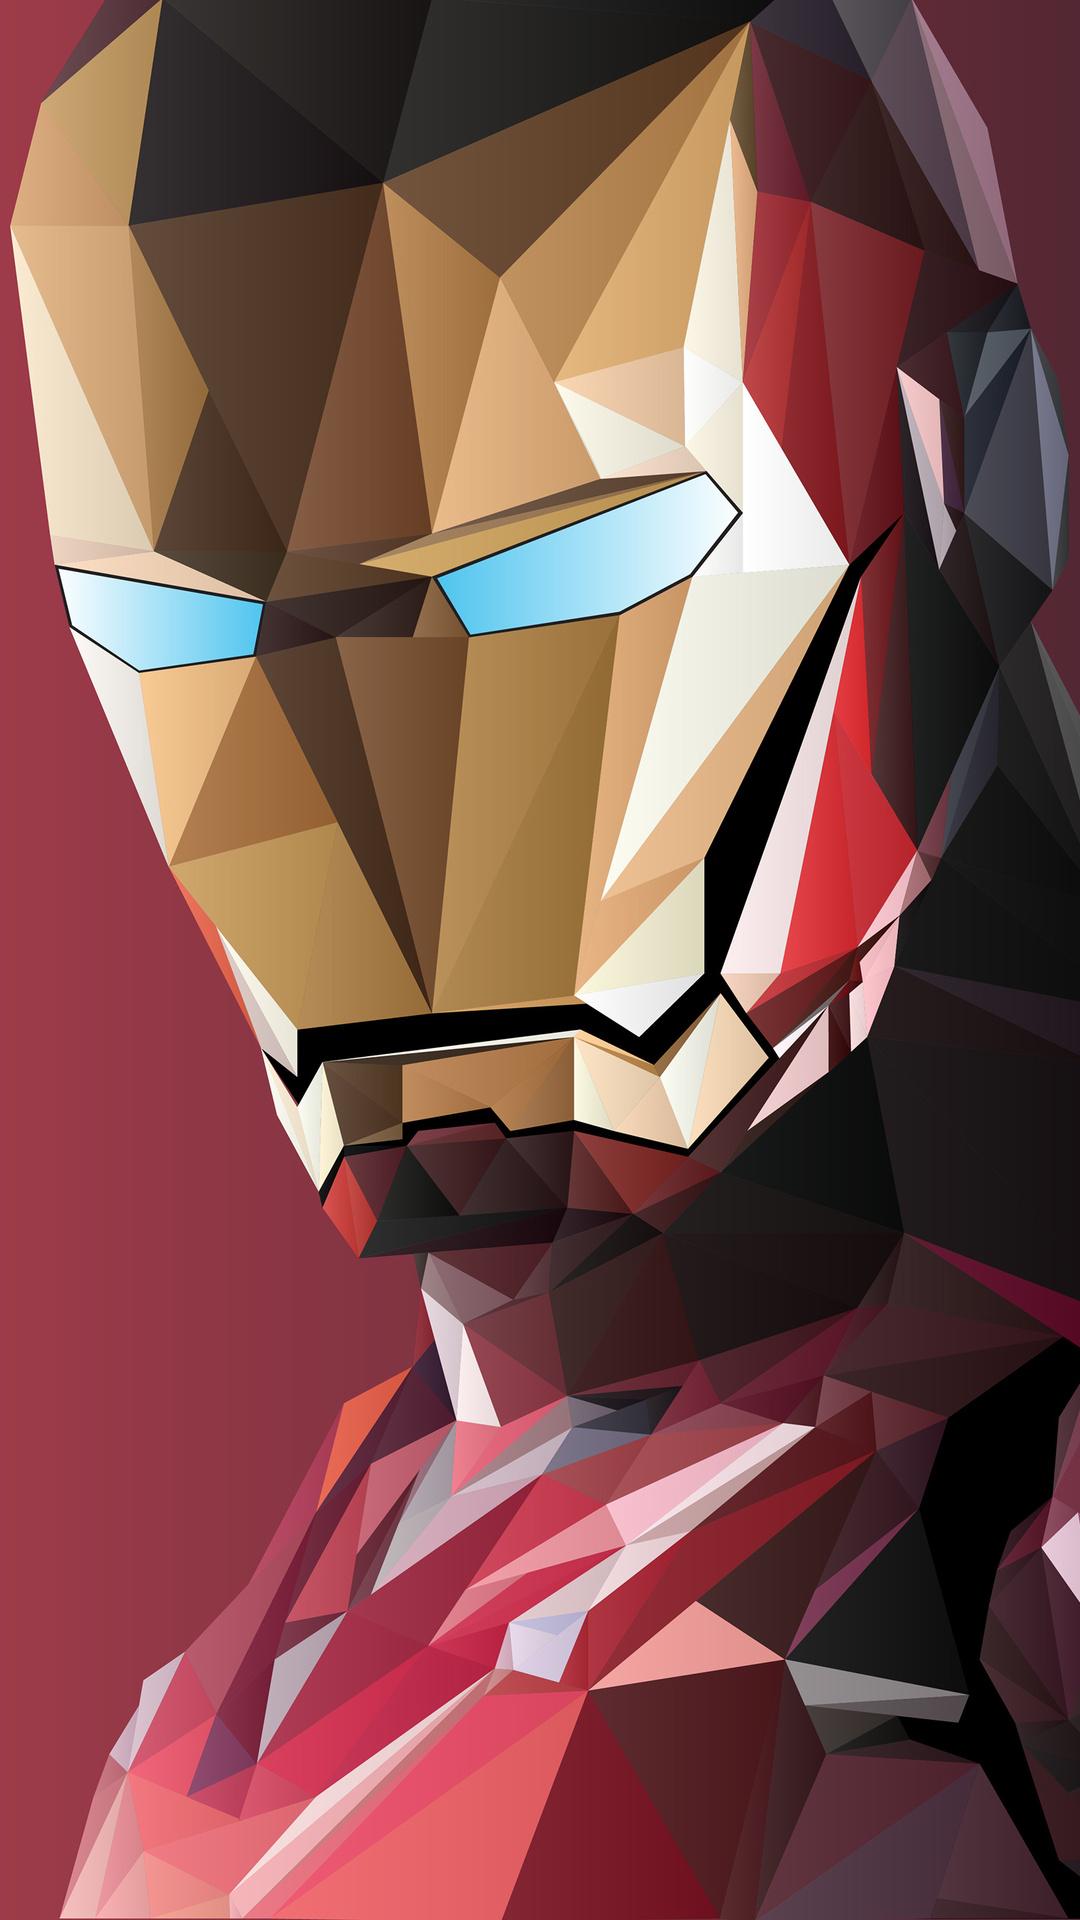 iron-man-facets-6p.jpg